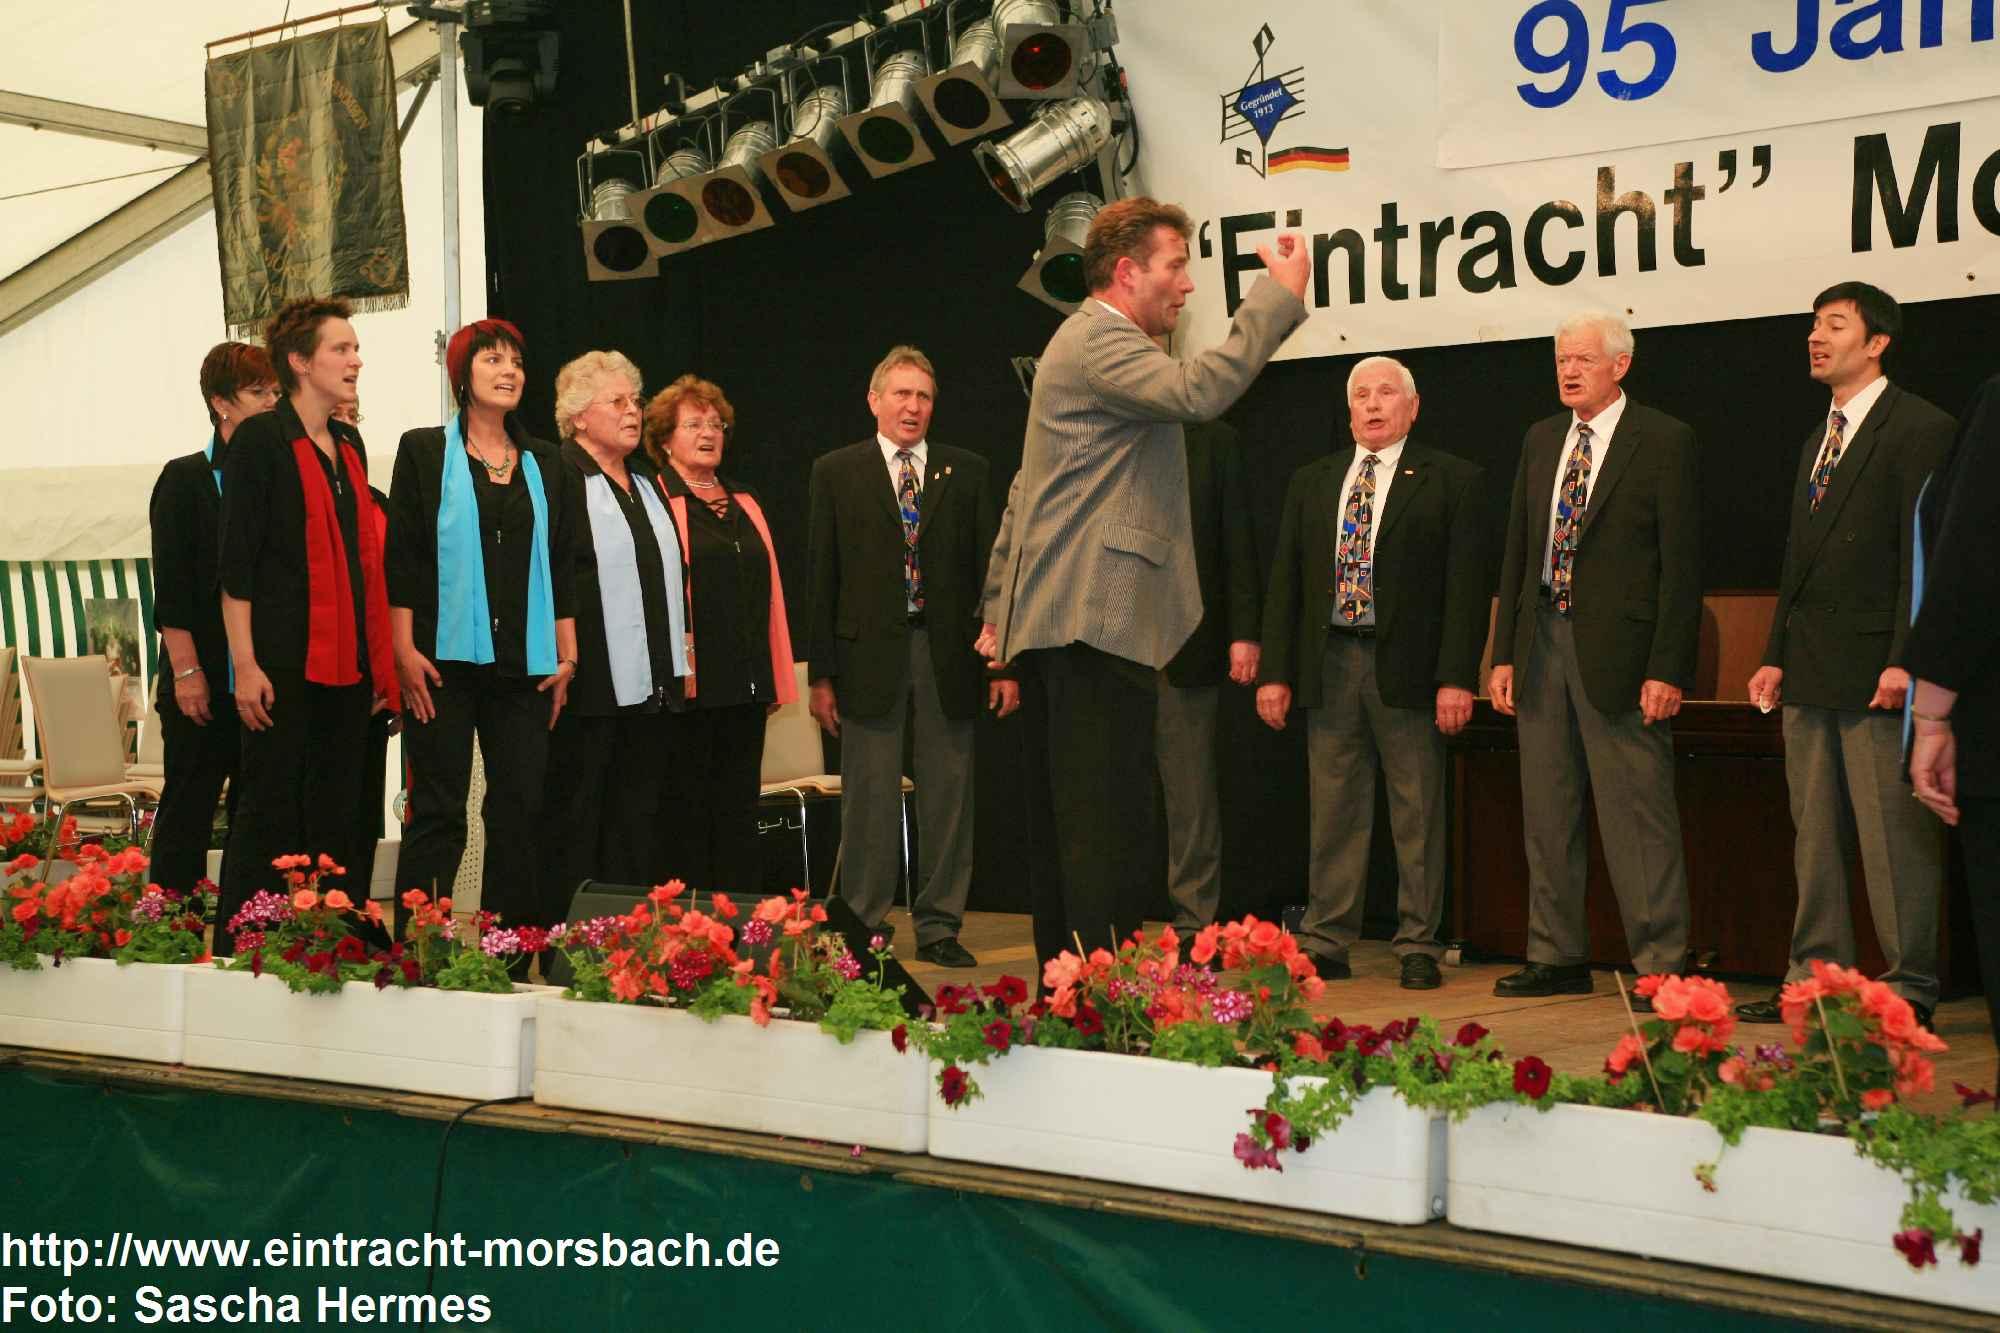 95-jahriges-jubilaum-240